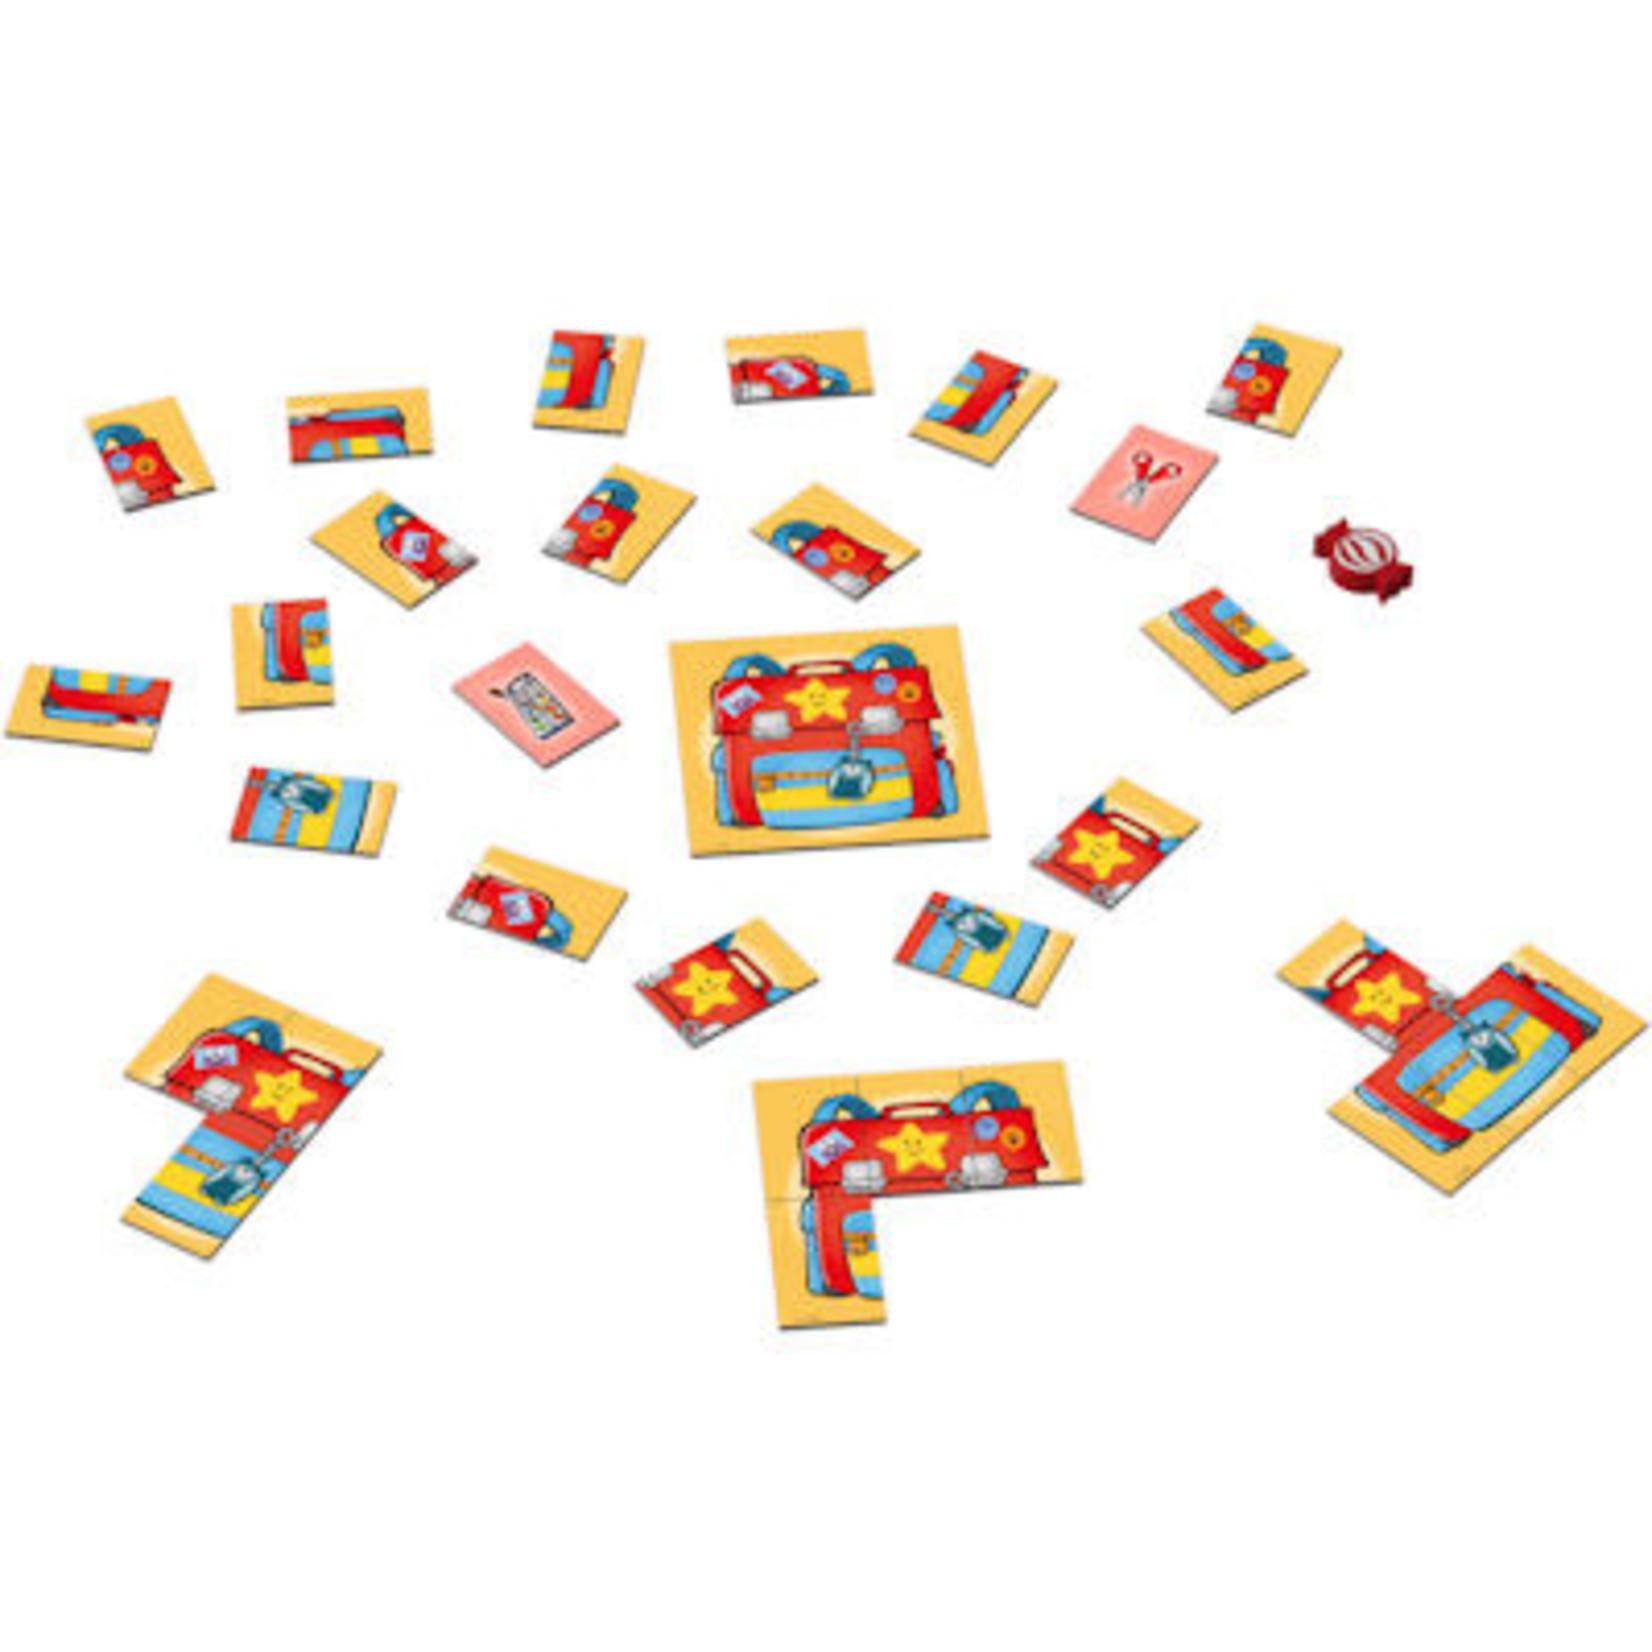 Haba Spel - Superminispel - Maak je boekentas